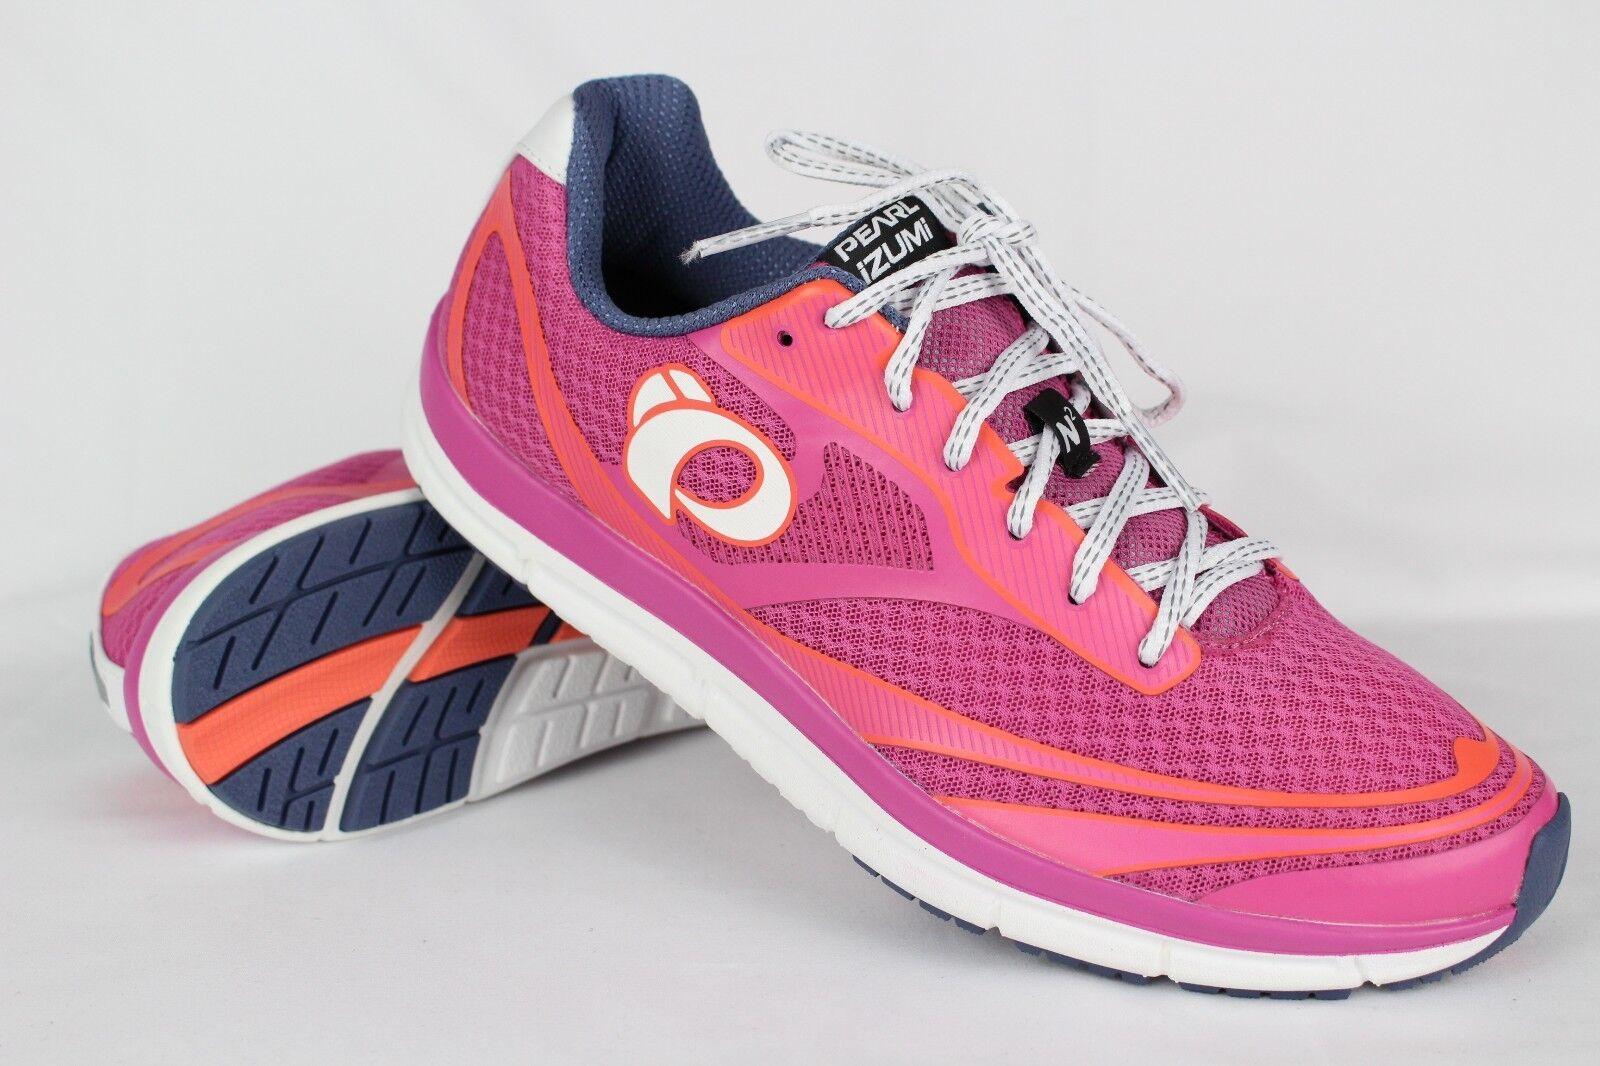 New Pearl Izumi Women's Road N2 V3 Road Running Training Size 11 Ibis Rose/White